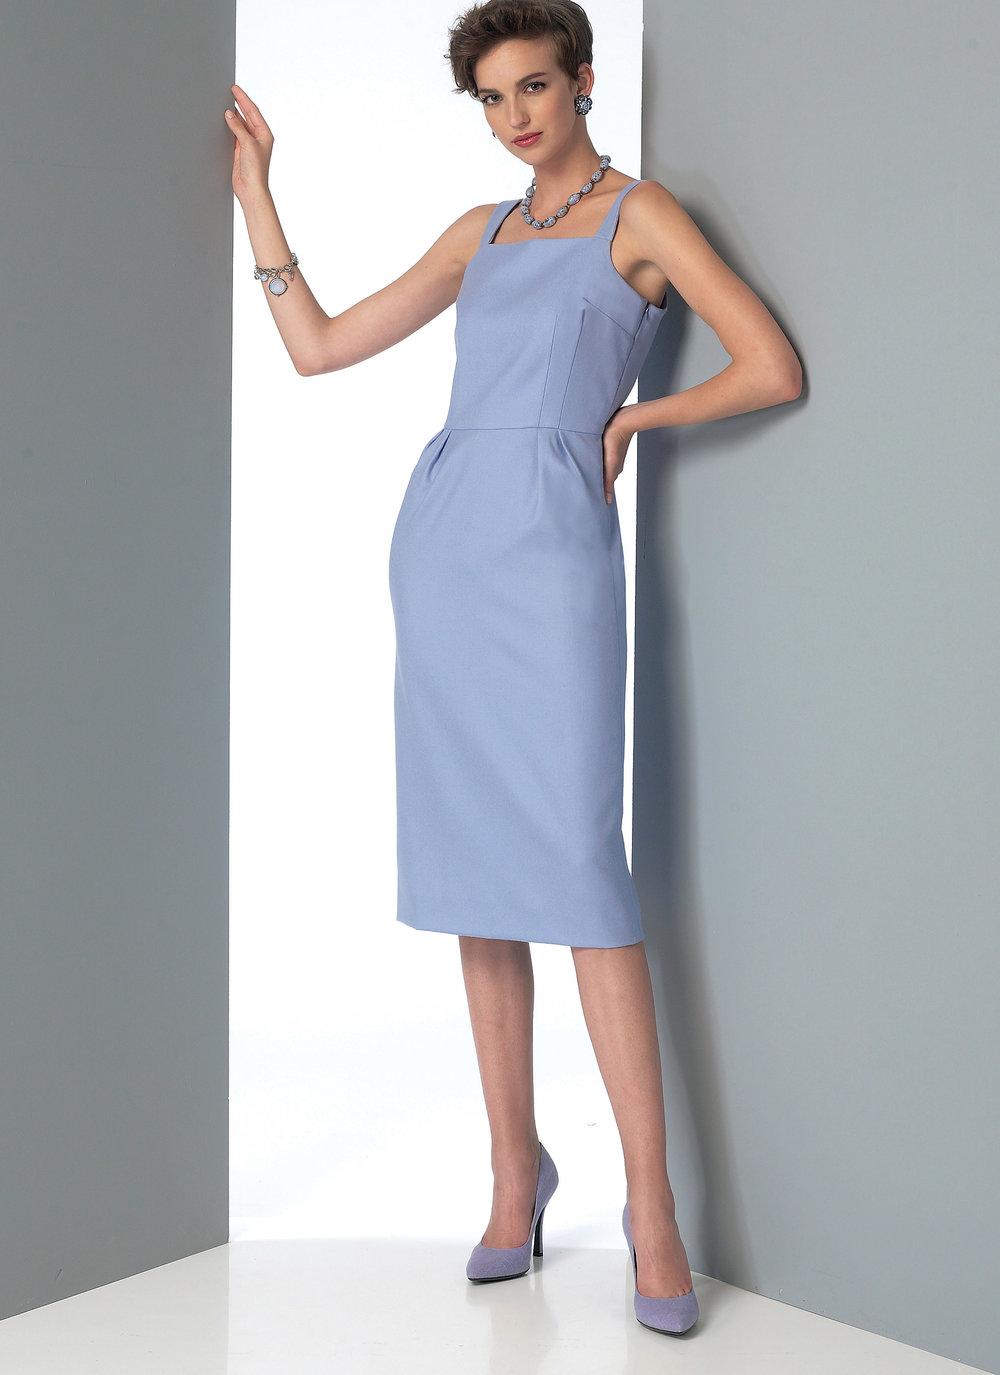 Vogue 9082 - wiggle dress.